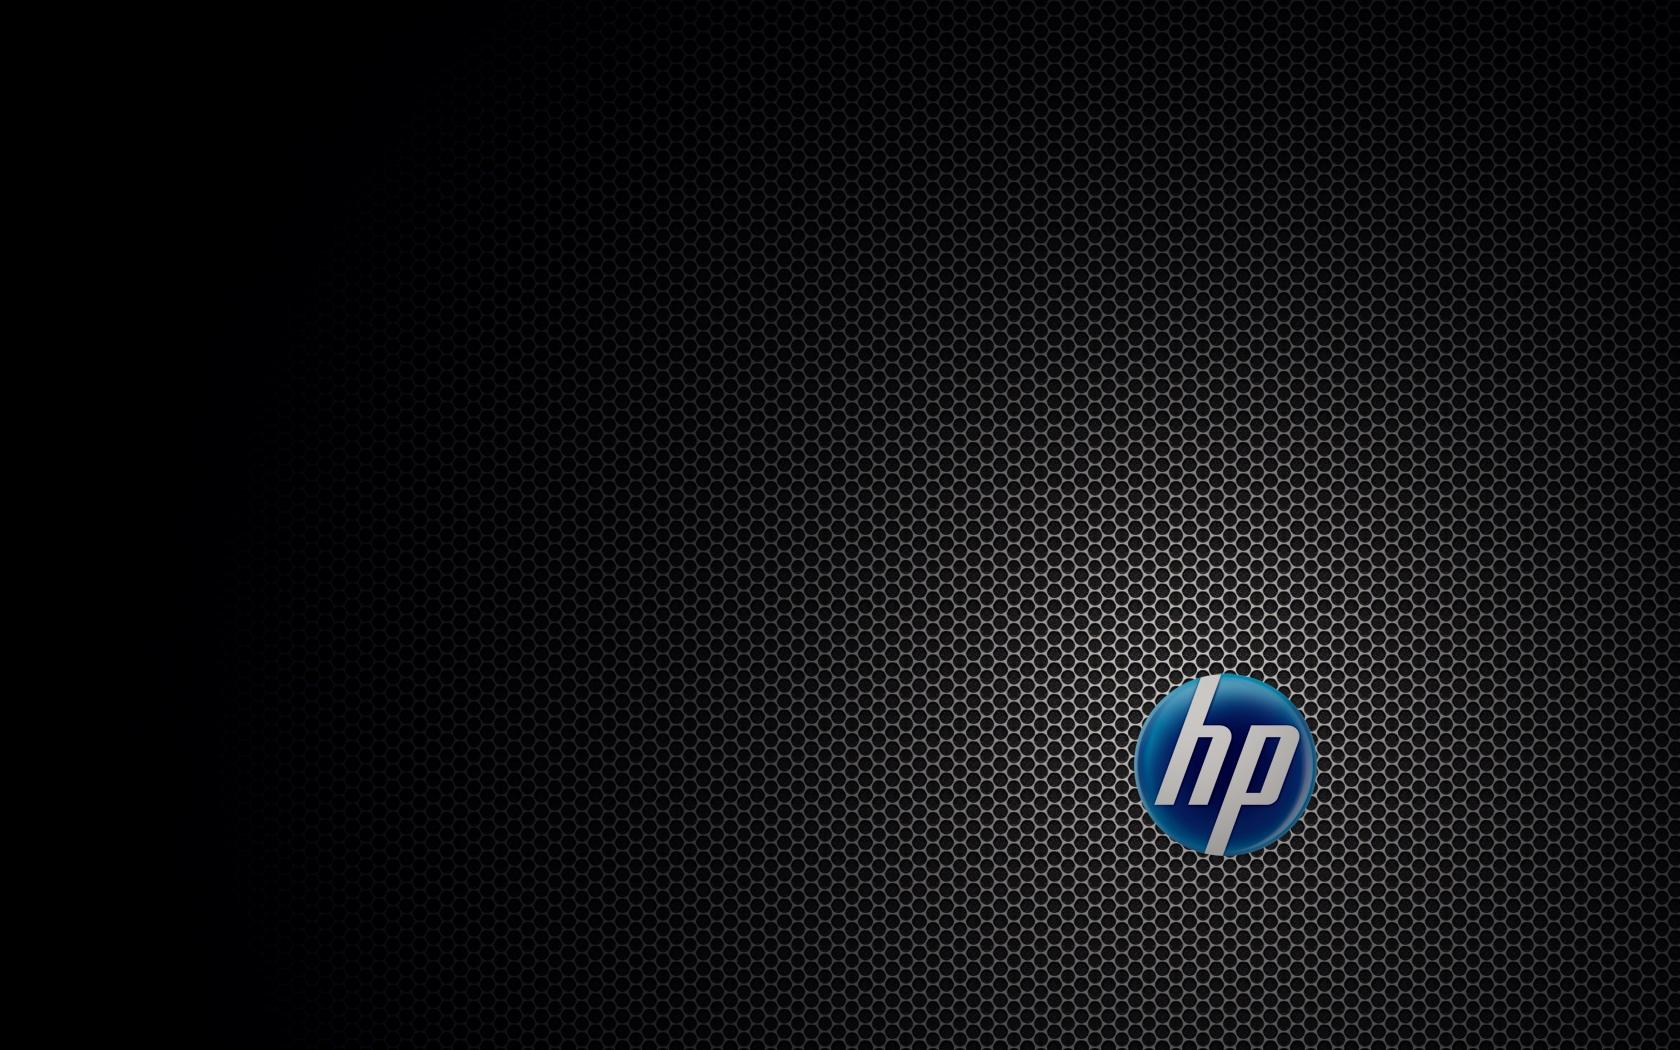 1680x1050 HP Spider Wall desktop PC and Mac wallpaper 1680x1050